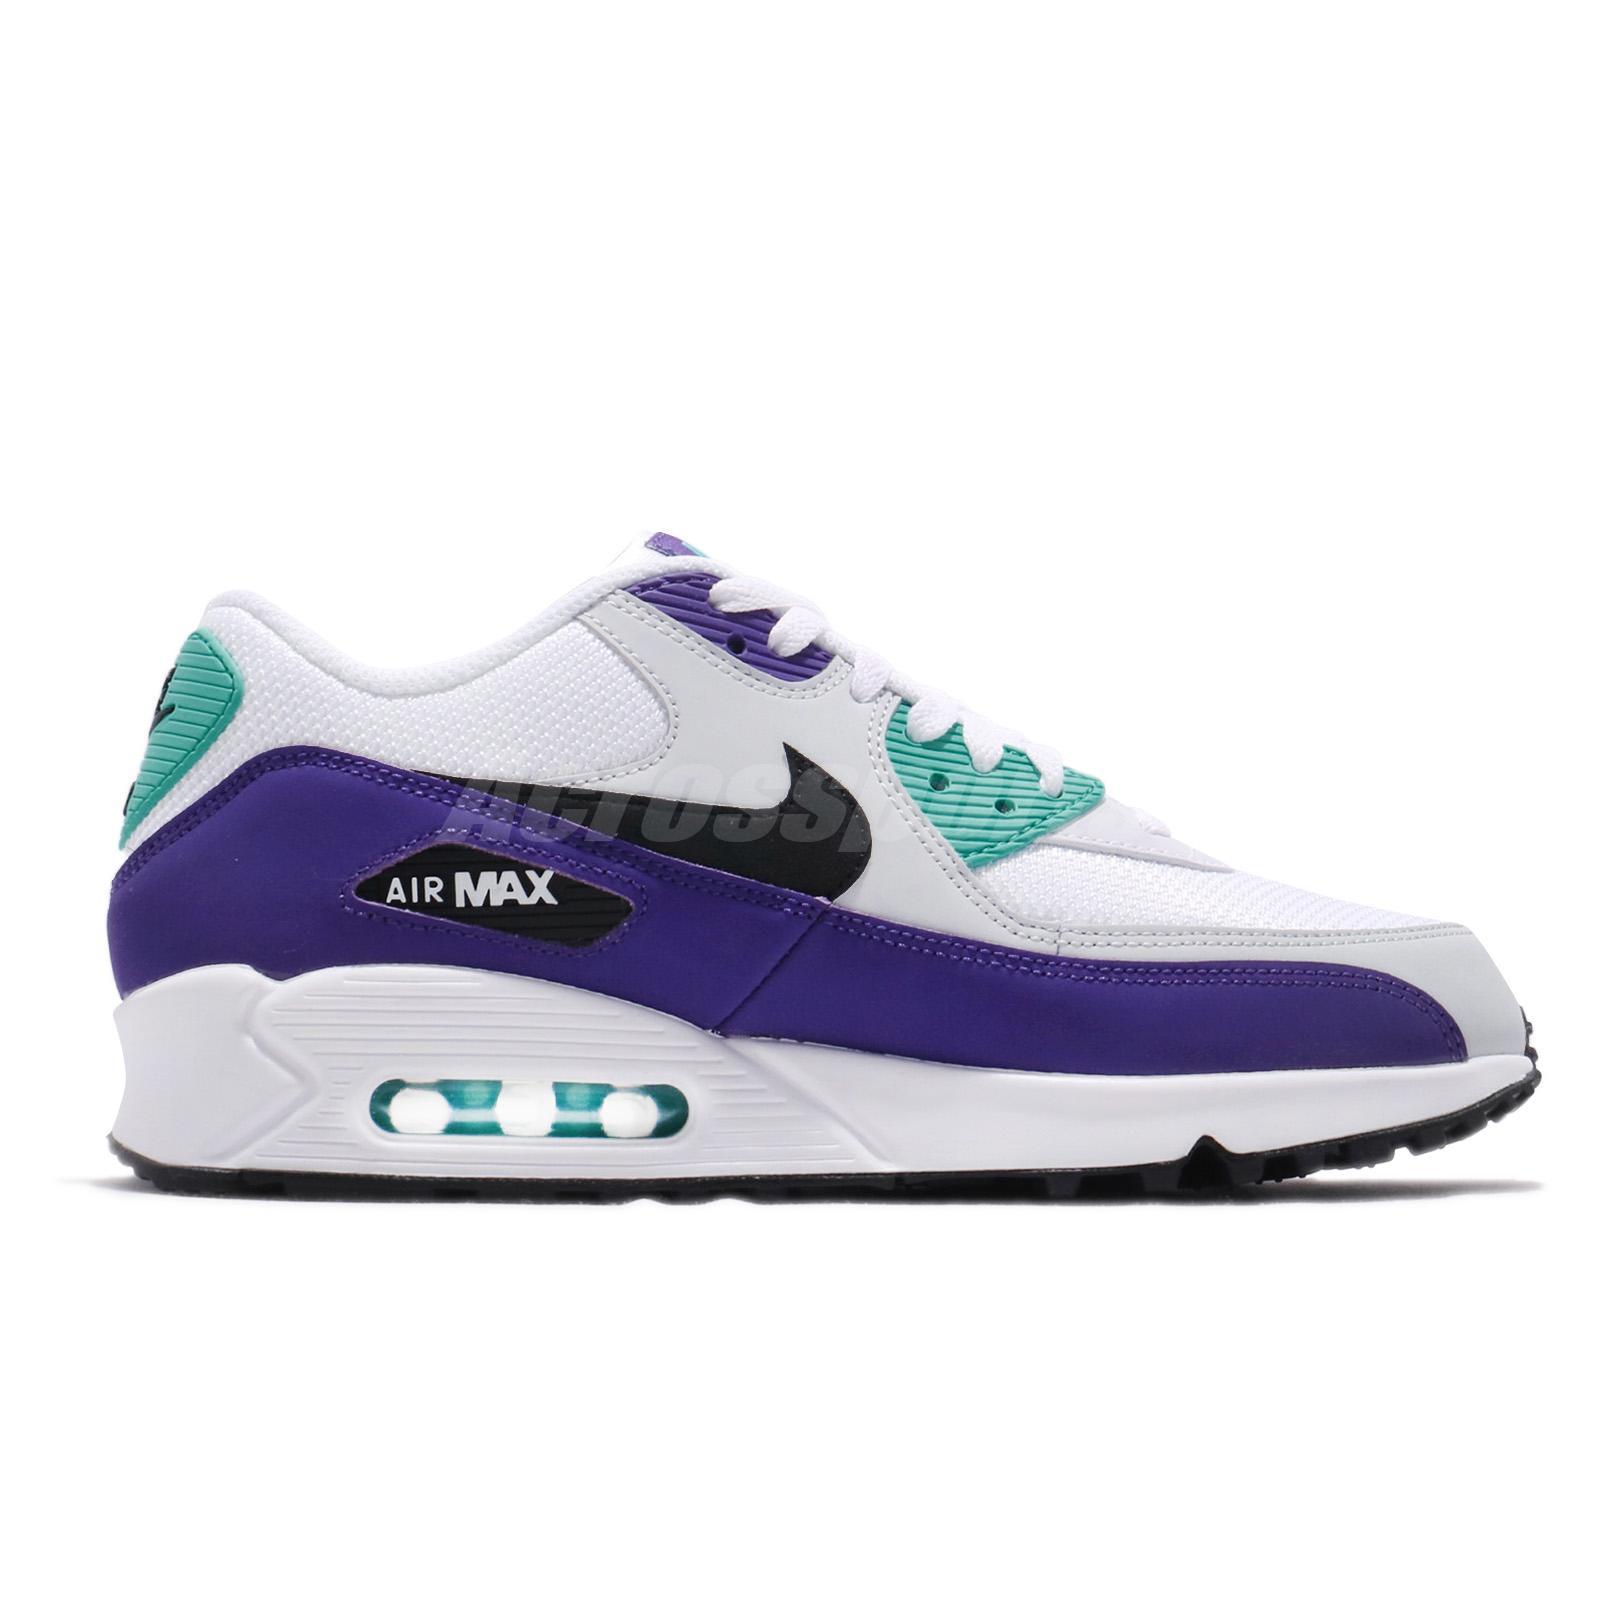 Details about Nike Air Max 90 Essential White Hyper Jade Purple Men Running Shoes AJ1285 103